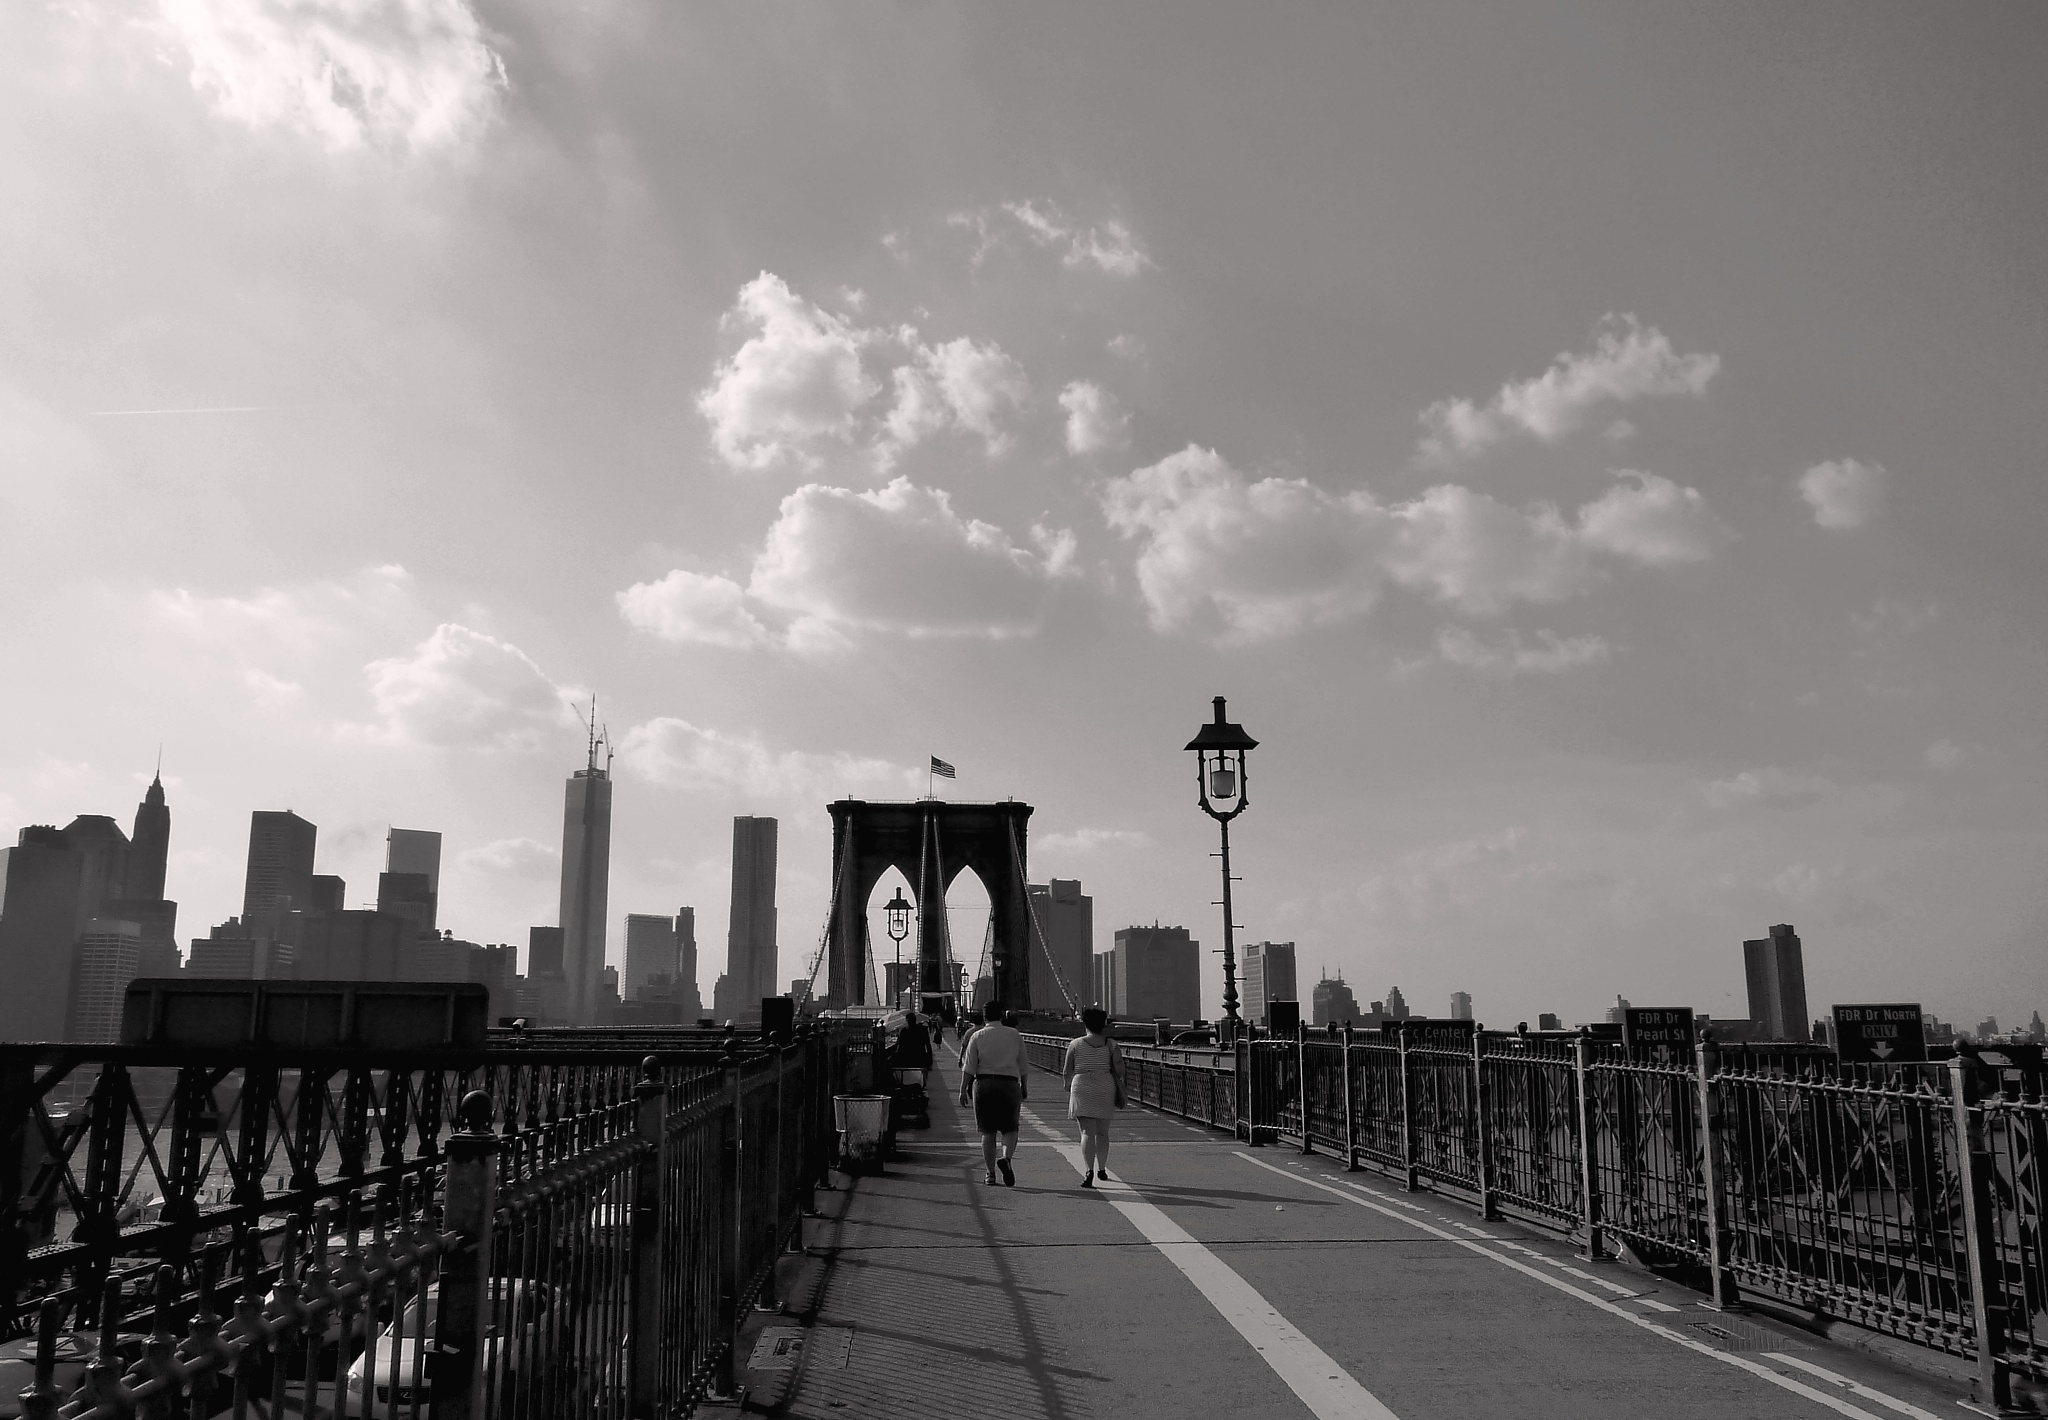 Crossing to Manhattan.  On the Brooklyn Bridge, NYC. by Anton Agalbato